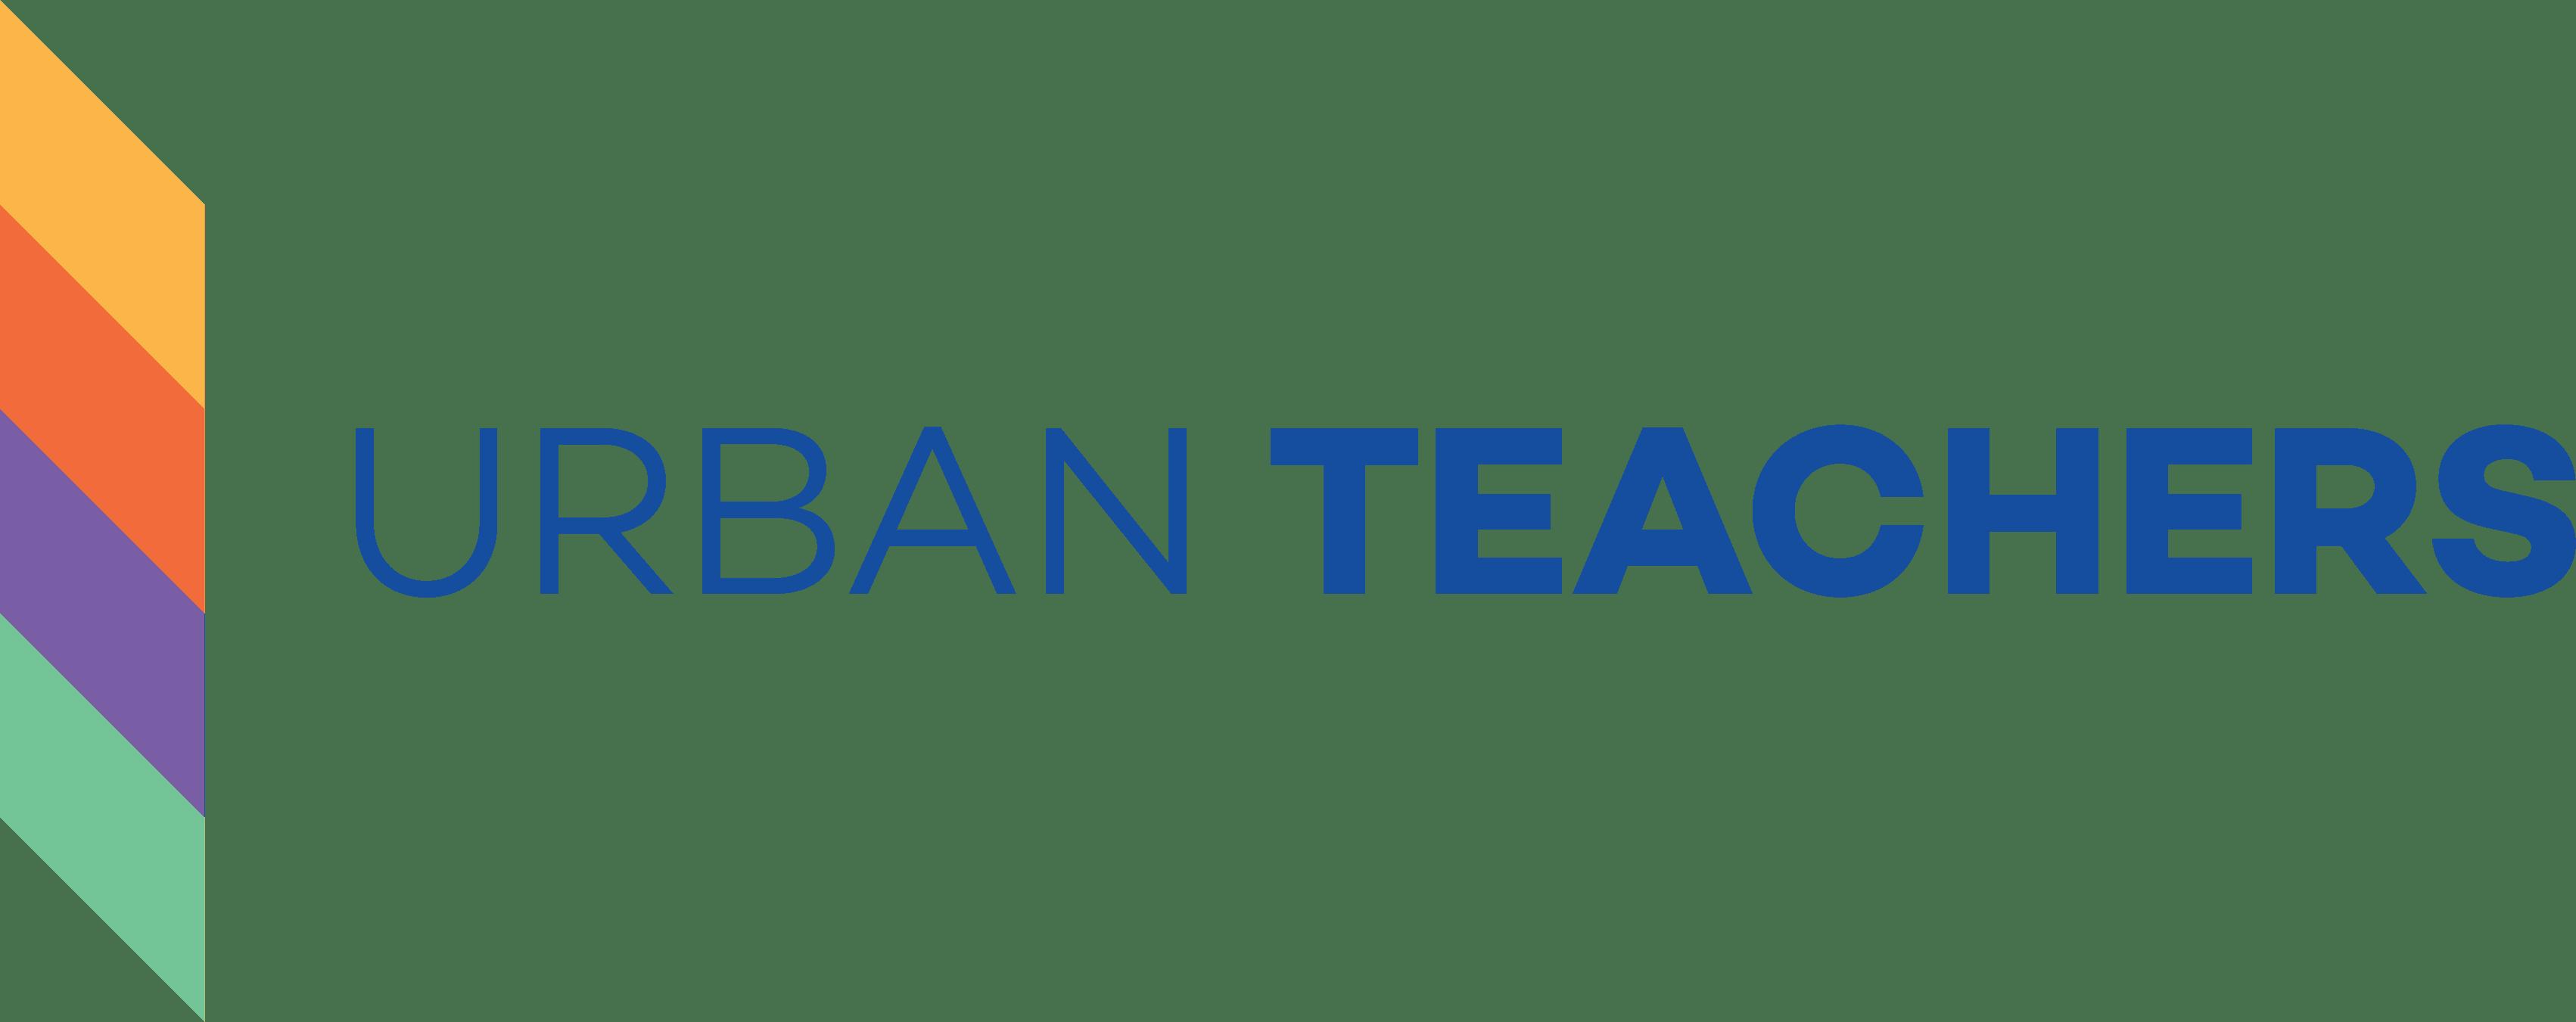 Urban Teachers